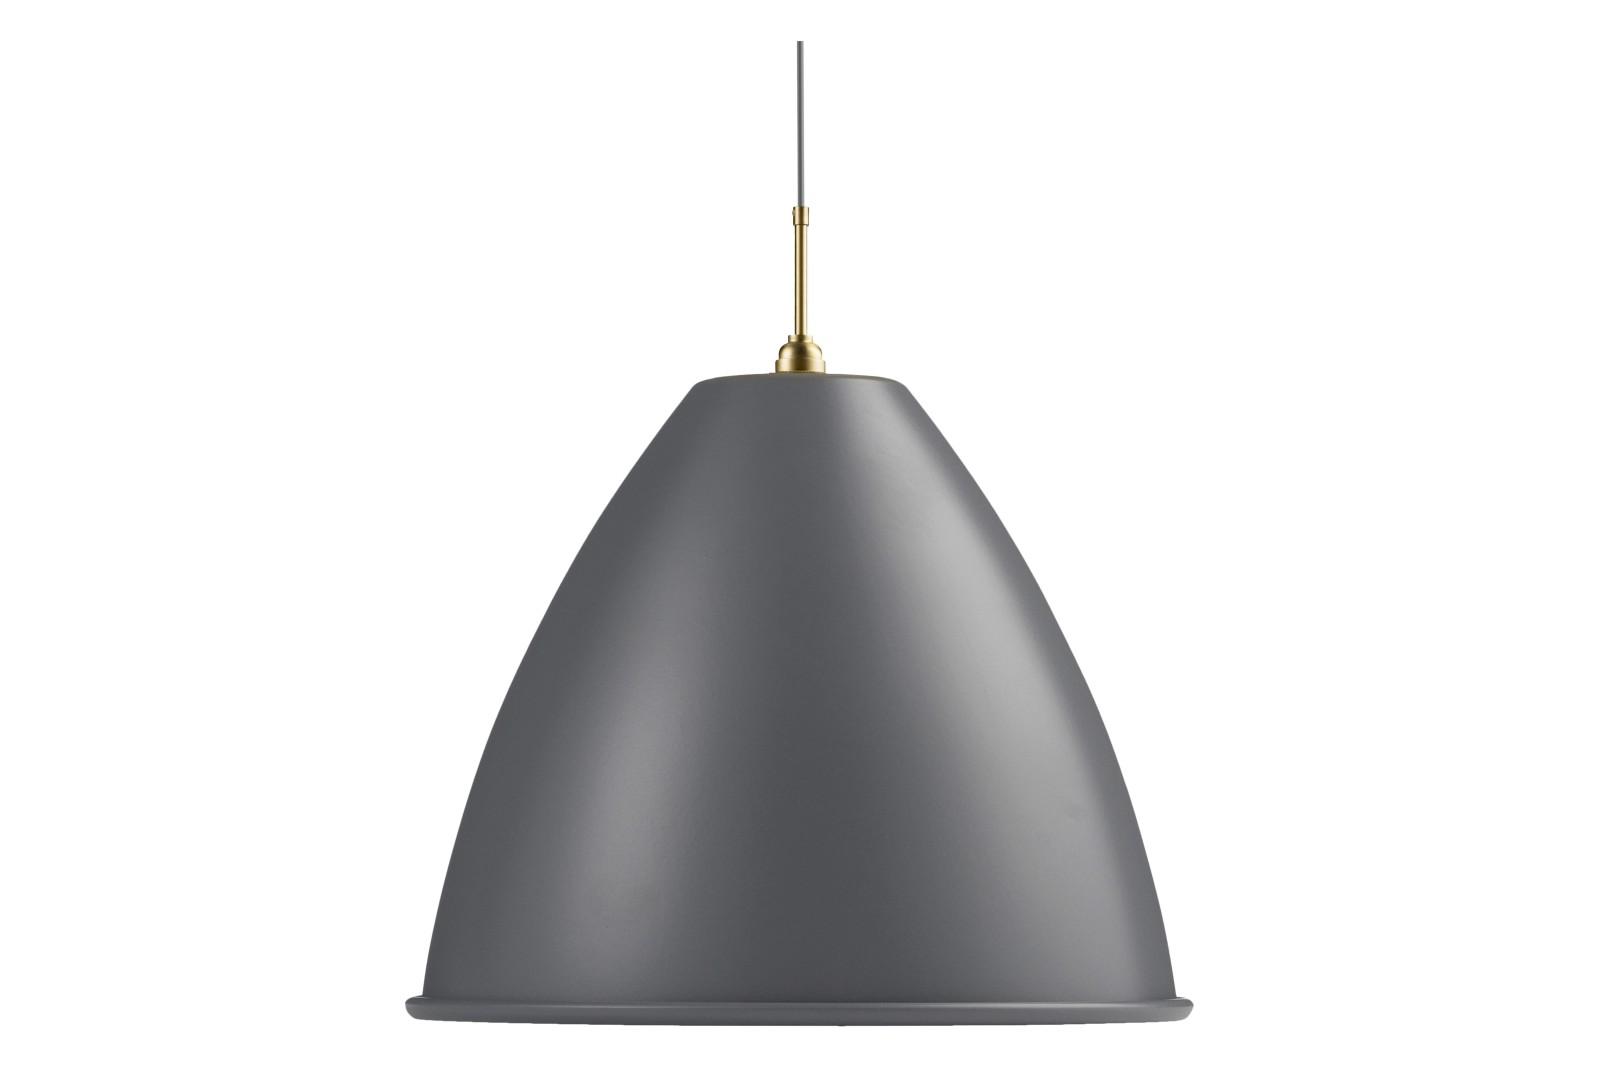 Bestlite BL9 Extra Large Pendant Light Grey/Brass